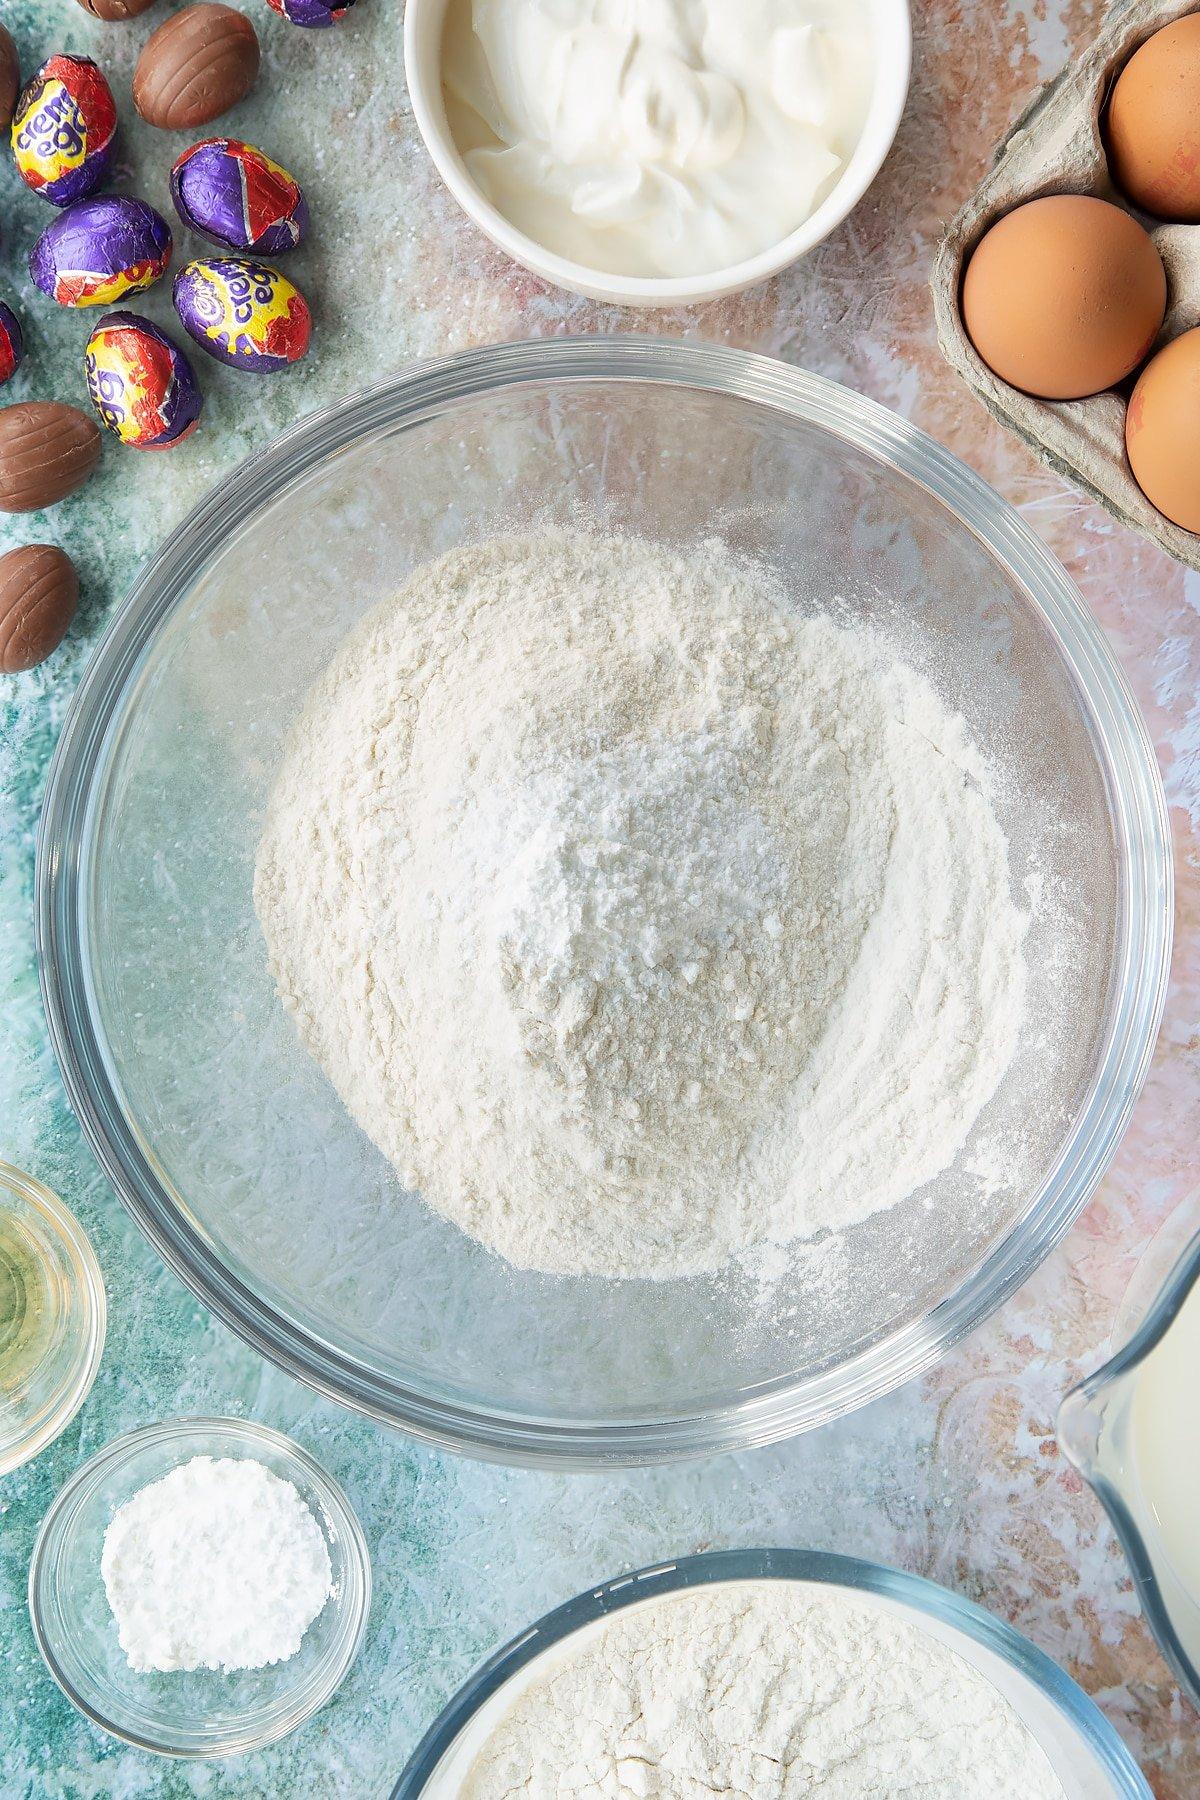 Self-raising flour and baking powder in a bowl. Ingredients to make Creme Egg pancakes surround the bowl.